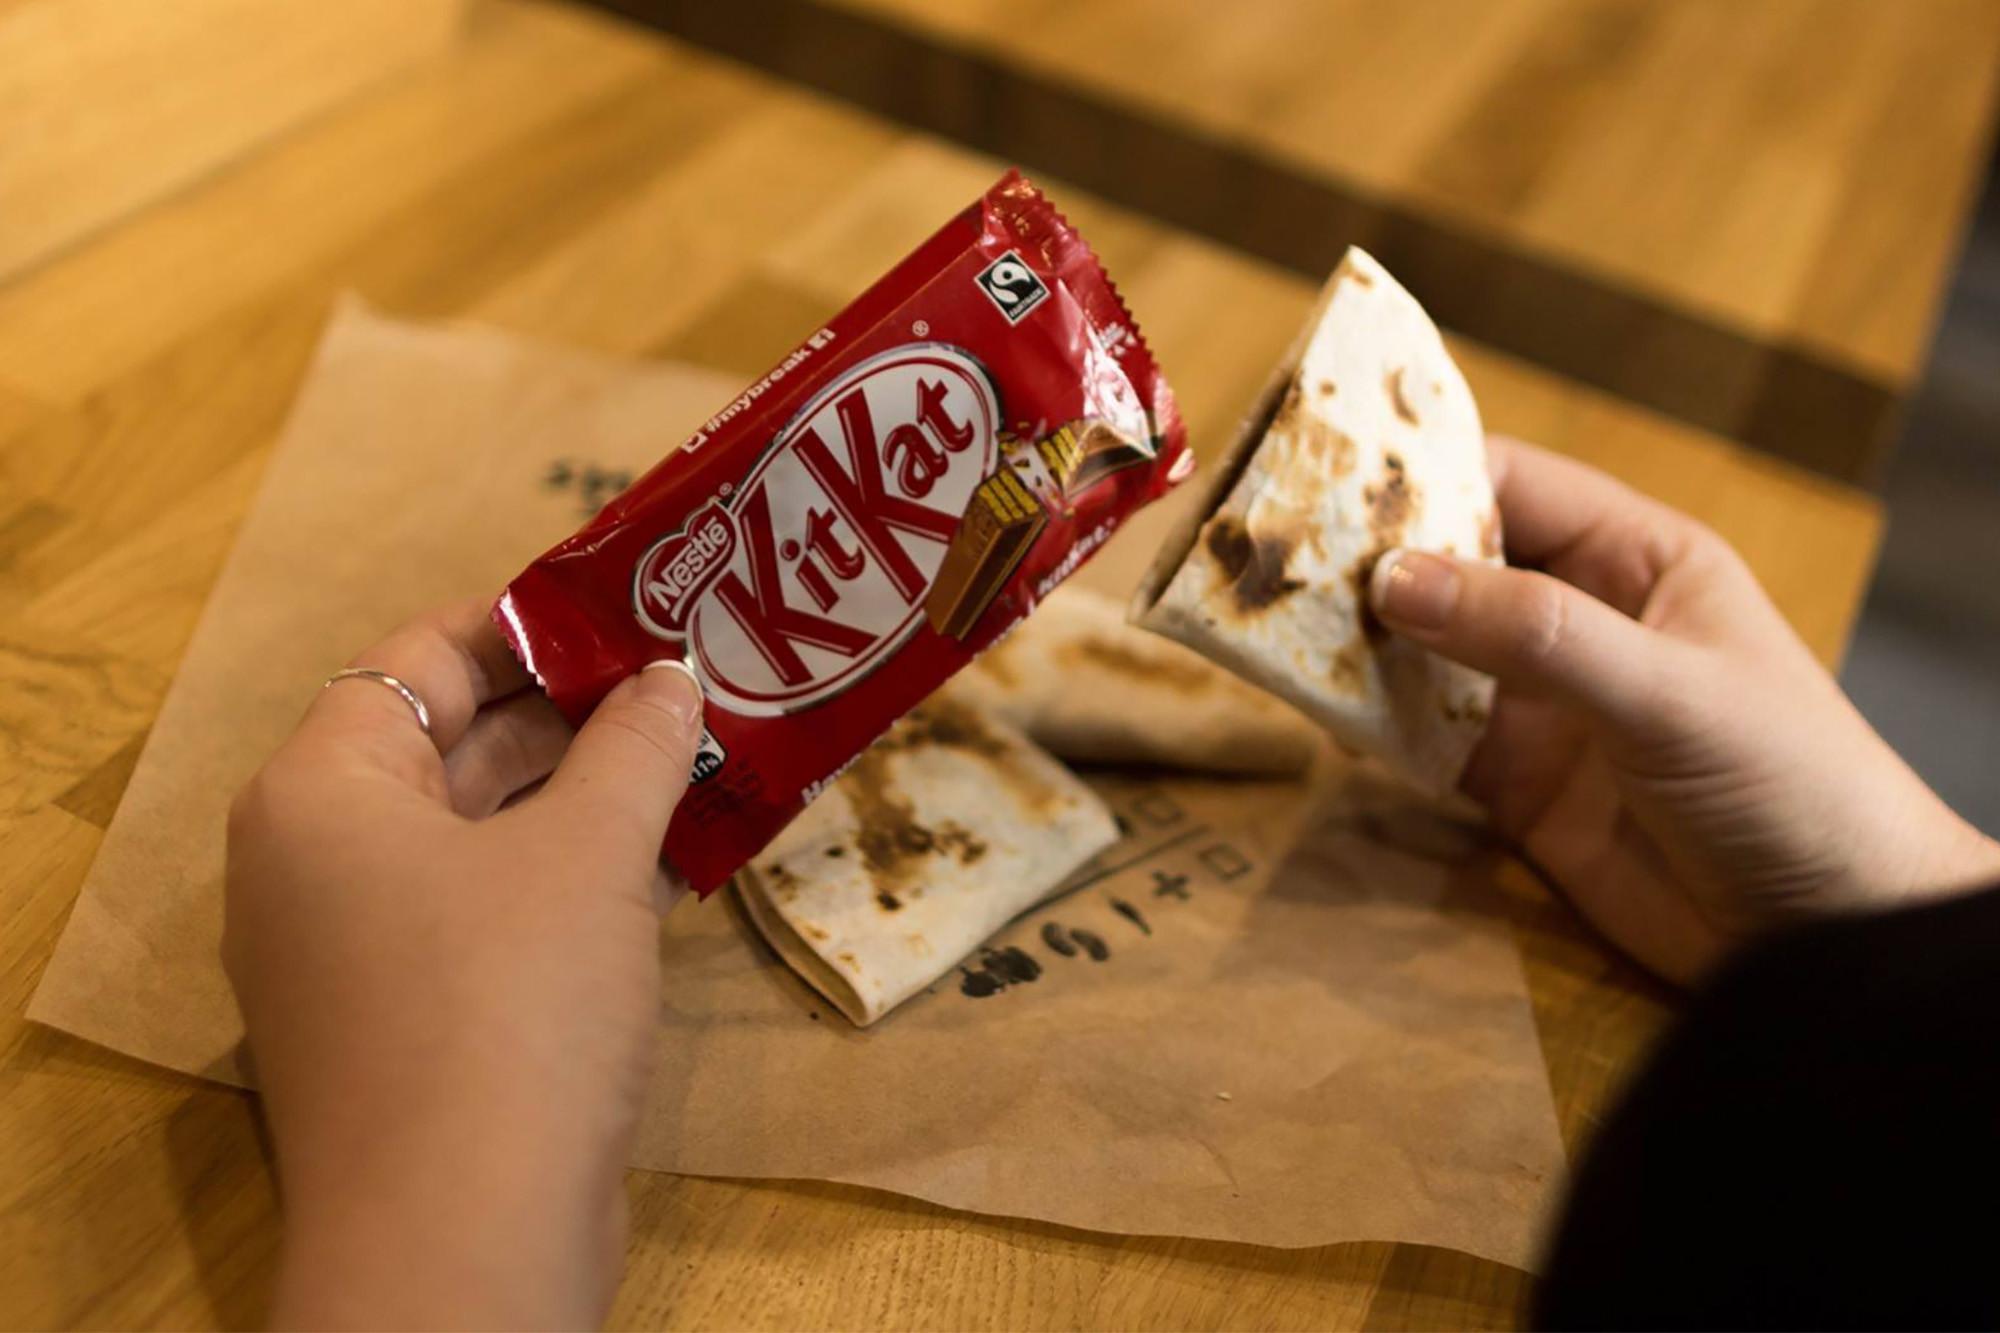 Taco Bell has a Kit Kat Quesadilla